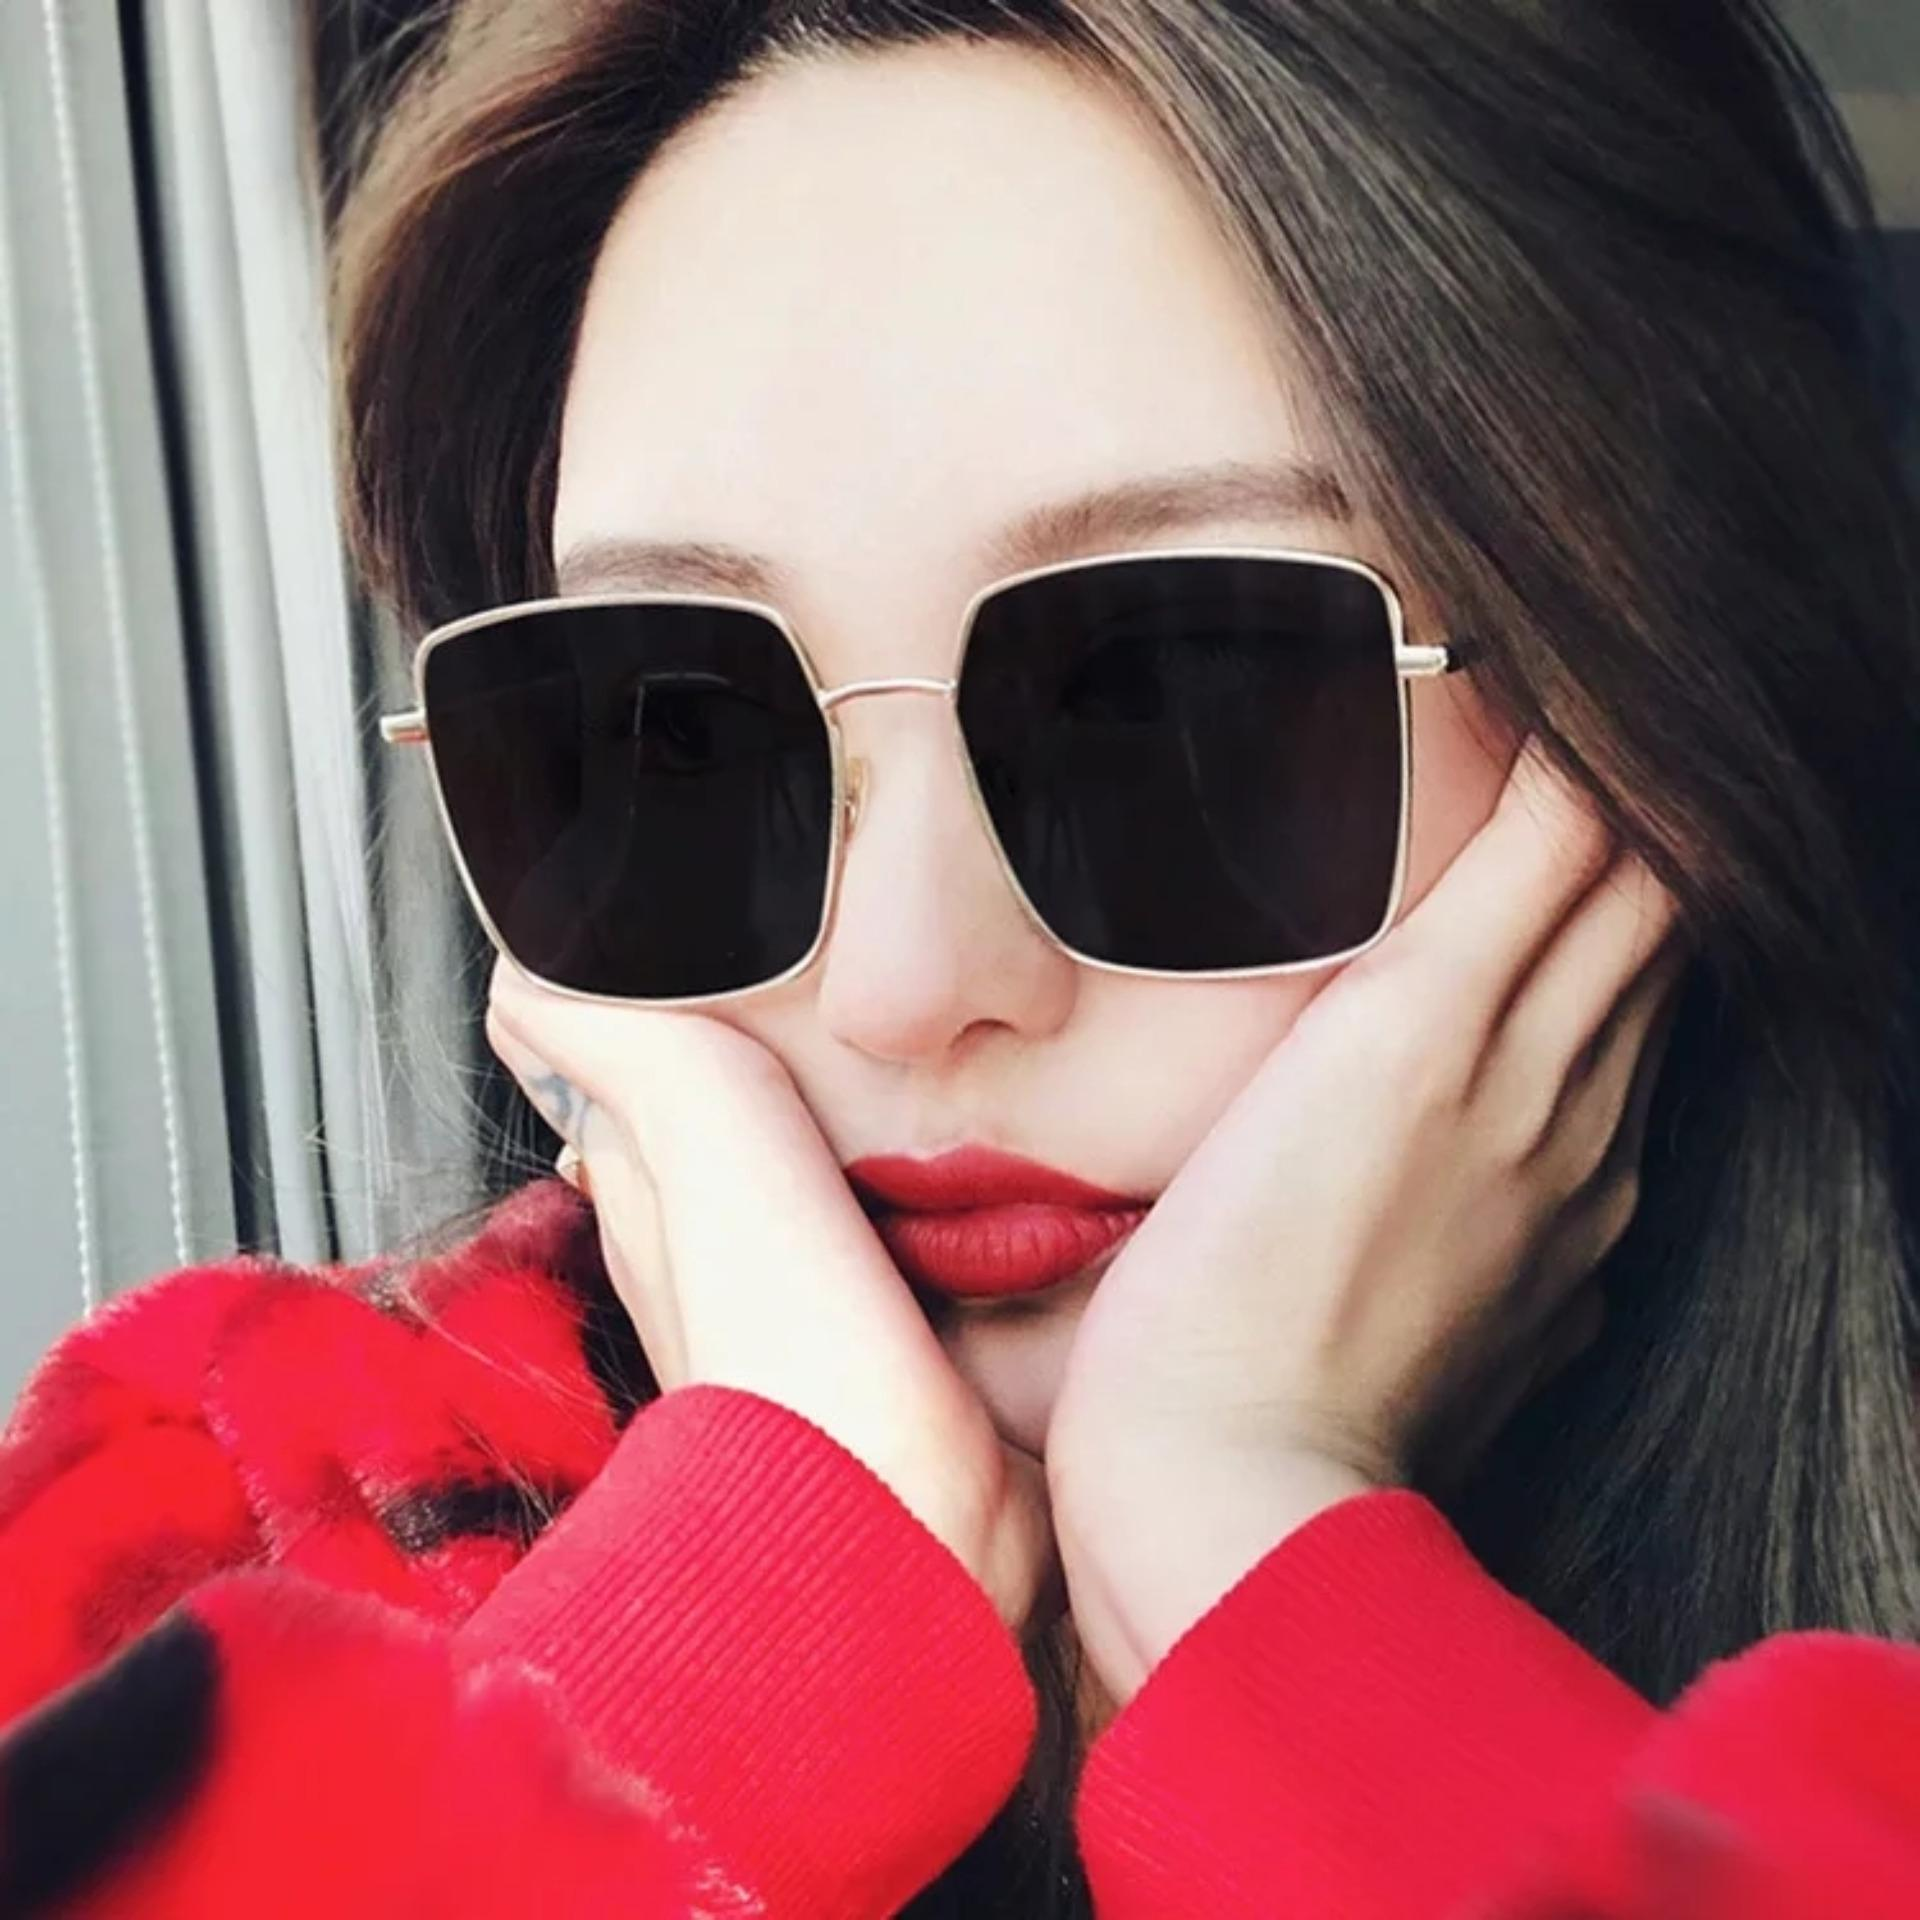 Fashionity Candy Sunglasses MN5016 Black - Kacamata wanita